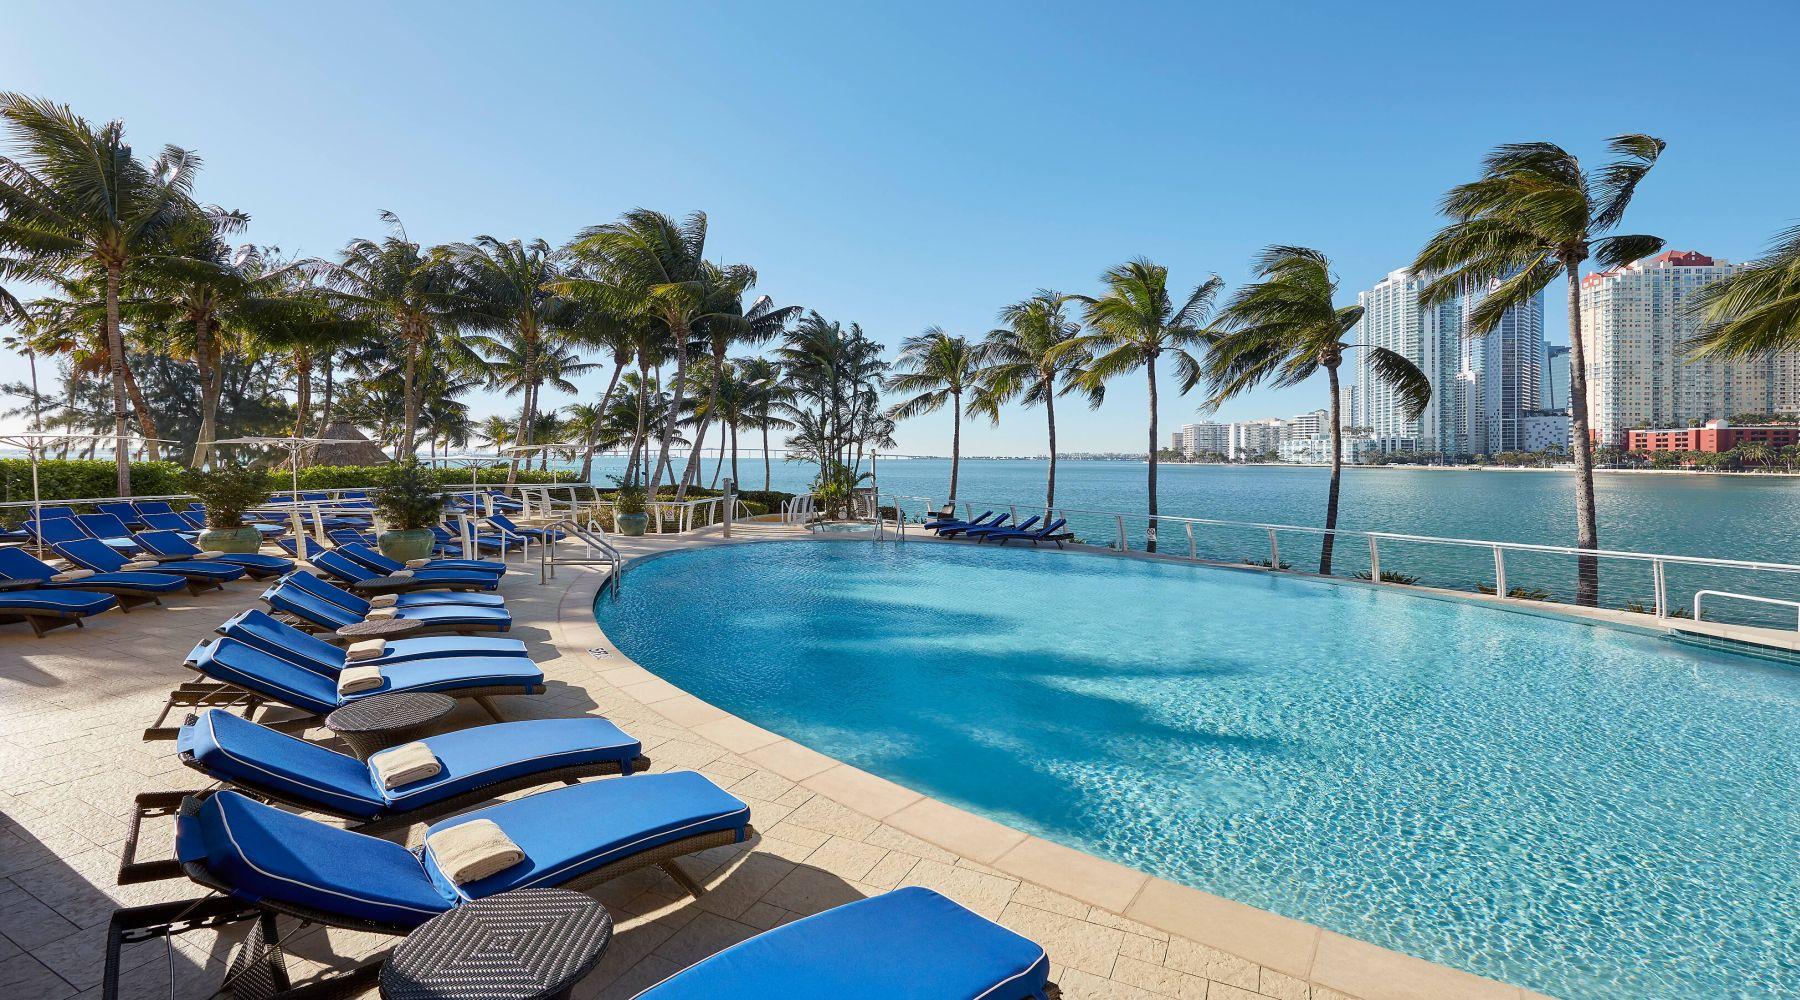 Mandarin Oriental, Miami, Floryda